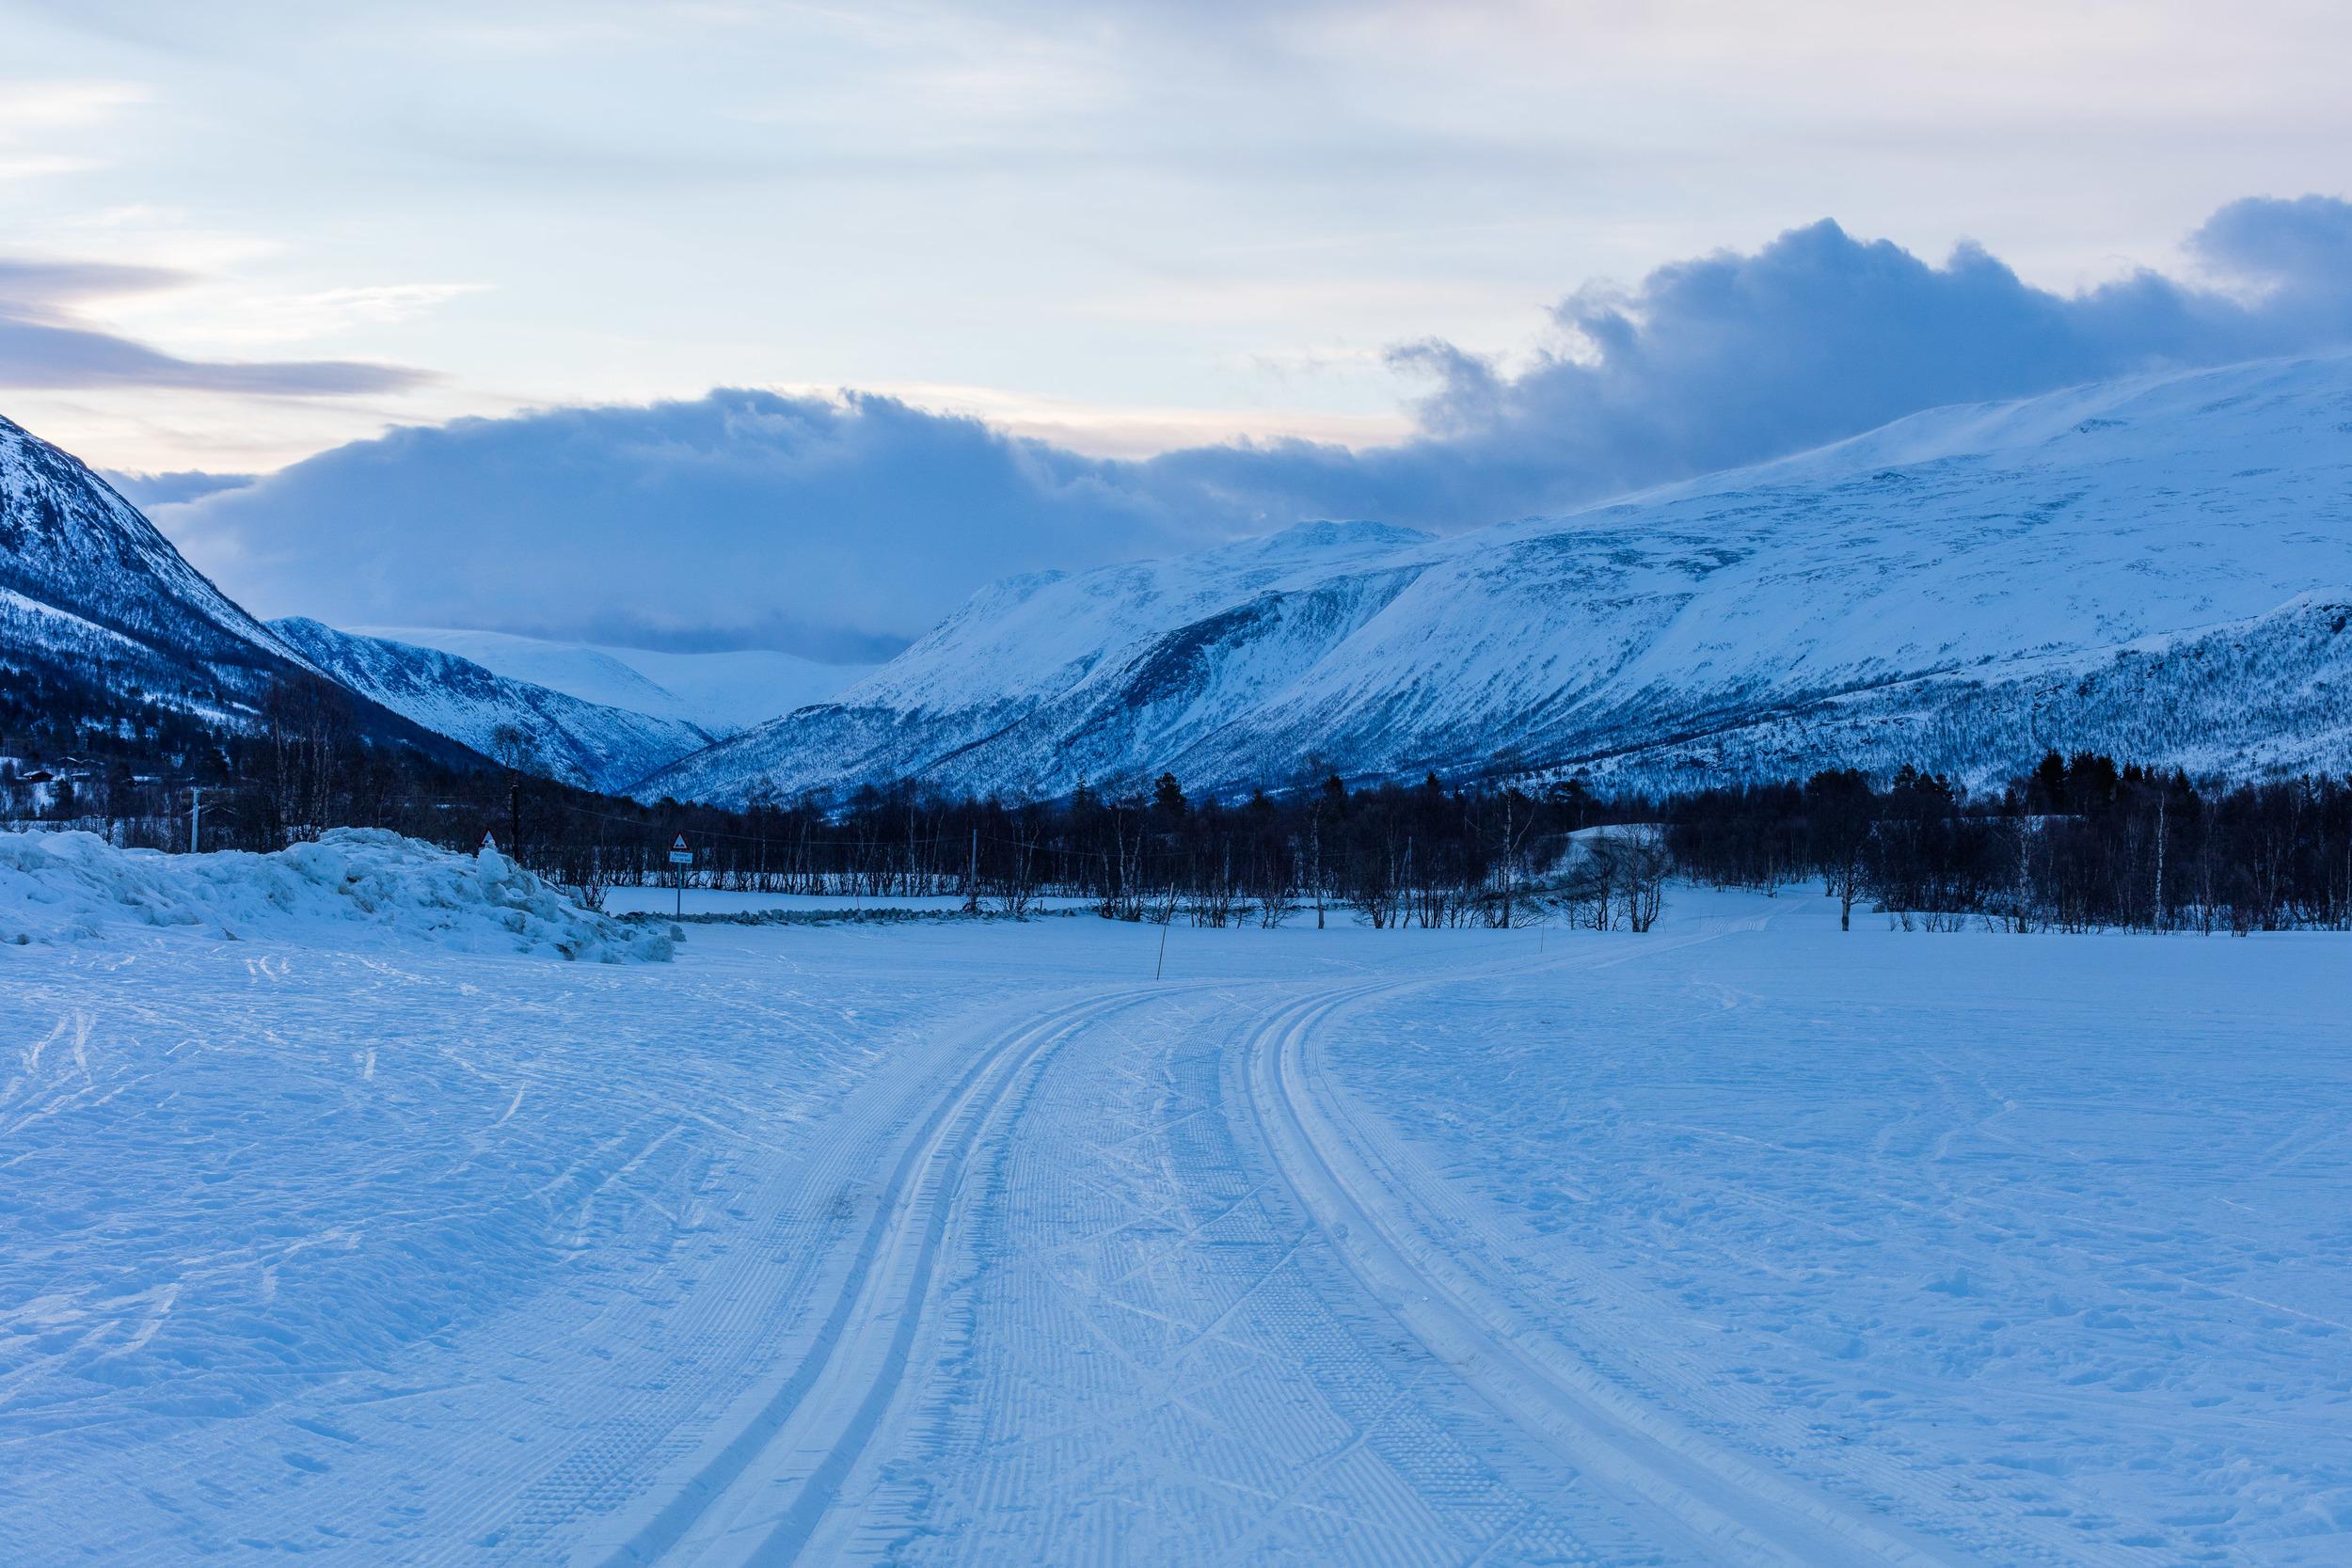 Bortistu-Storlidalen-Oppdal-Norge-Sven-Erik-Knoff-FotoKnoff-60.jpg